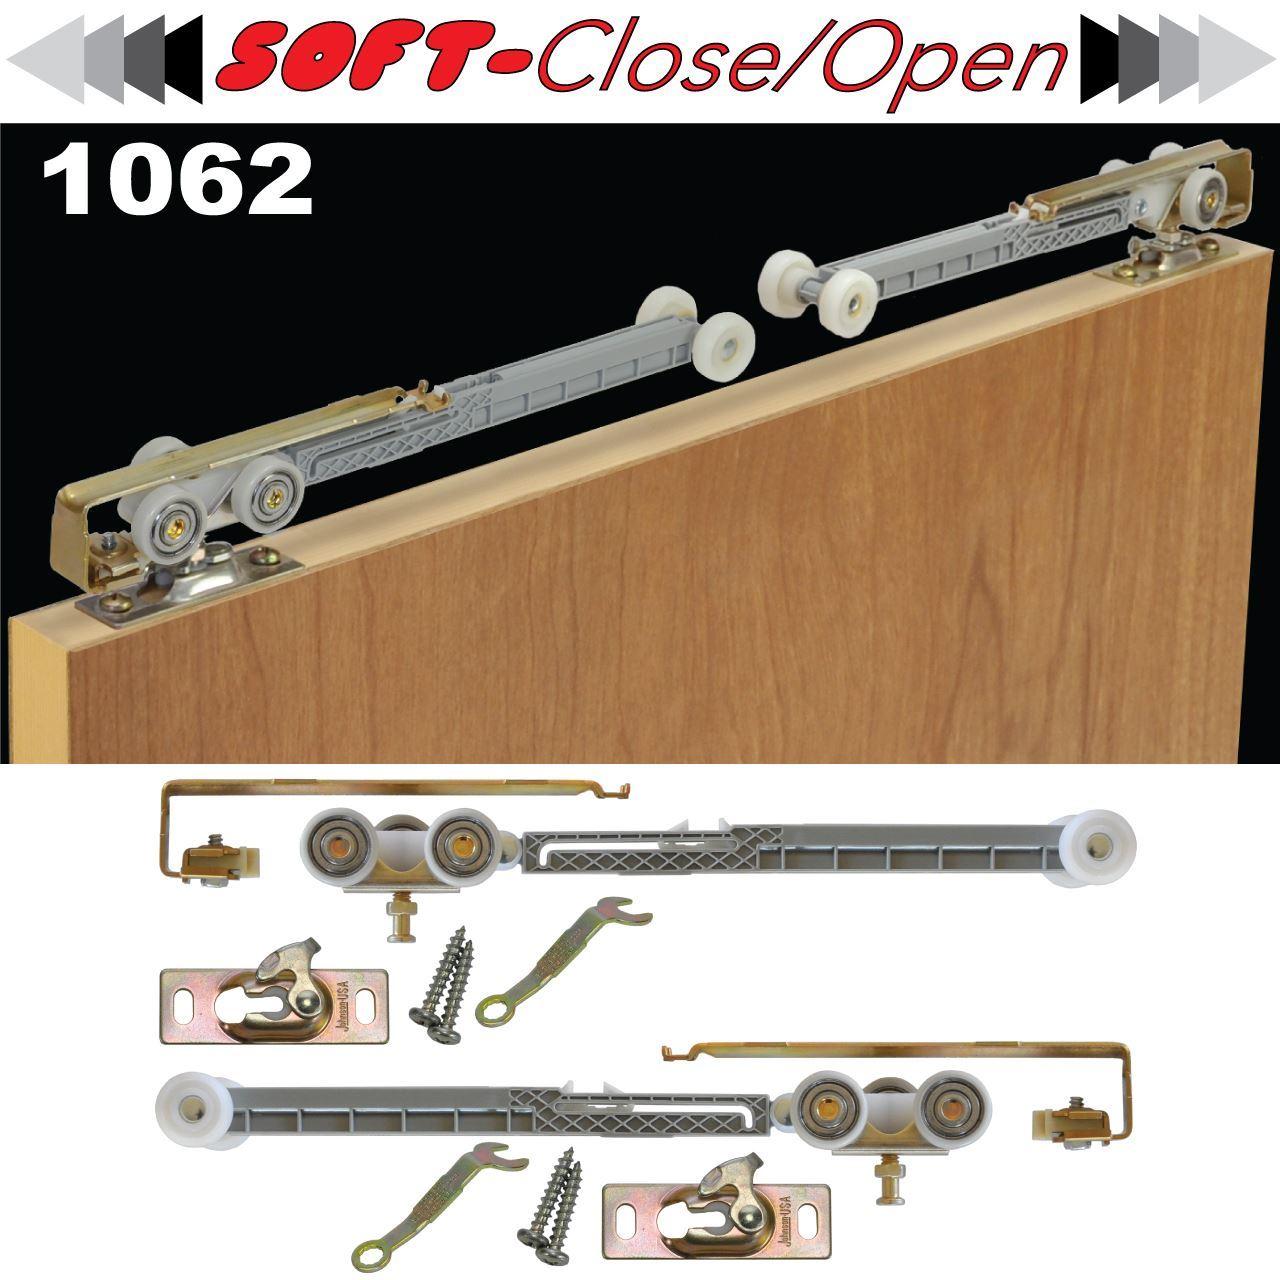 1062 Soft Close Kit Johnsonhardware Sliding Folding